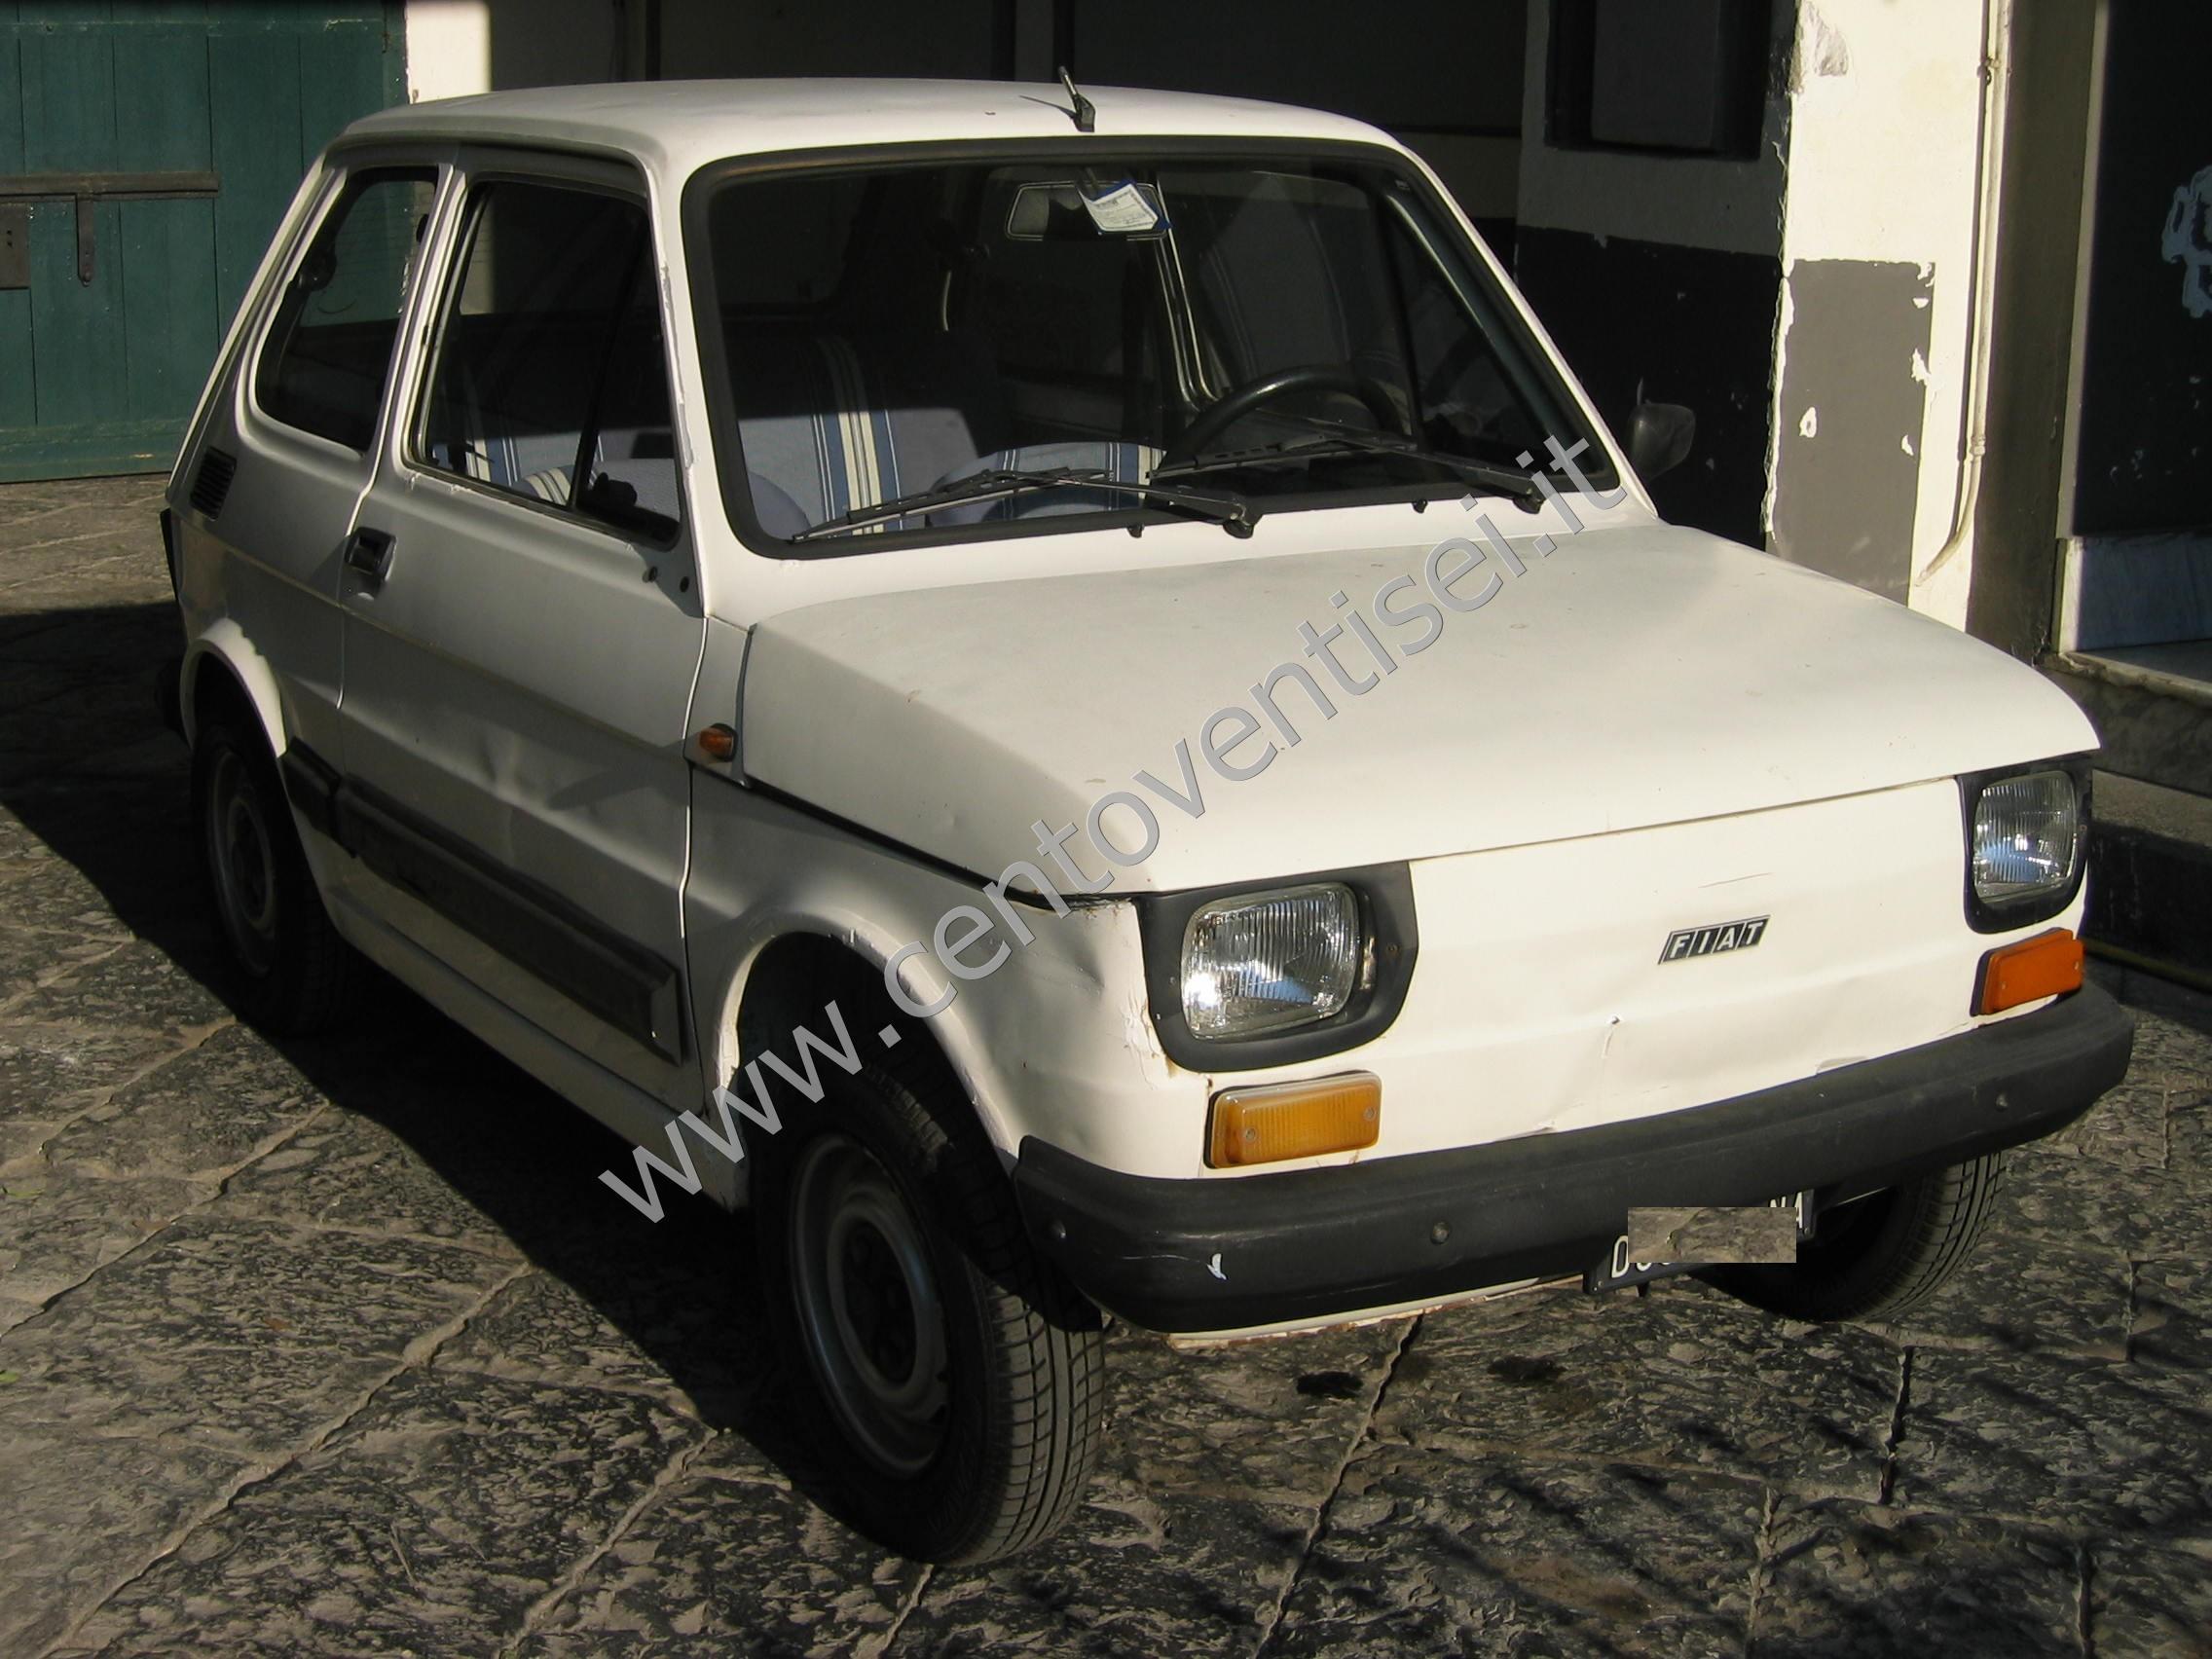 Fiat 127 coriasco